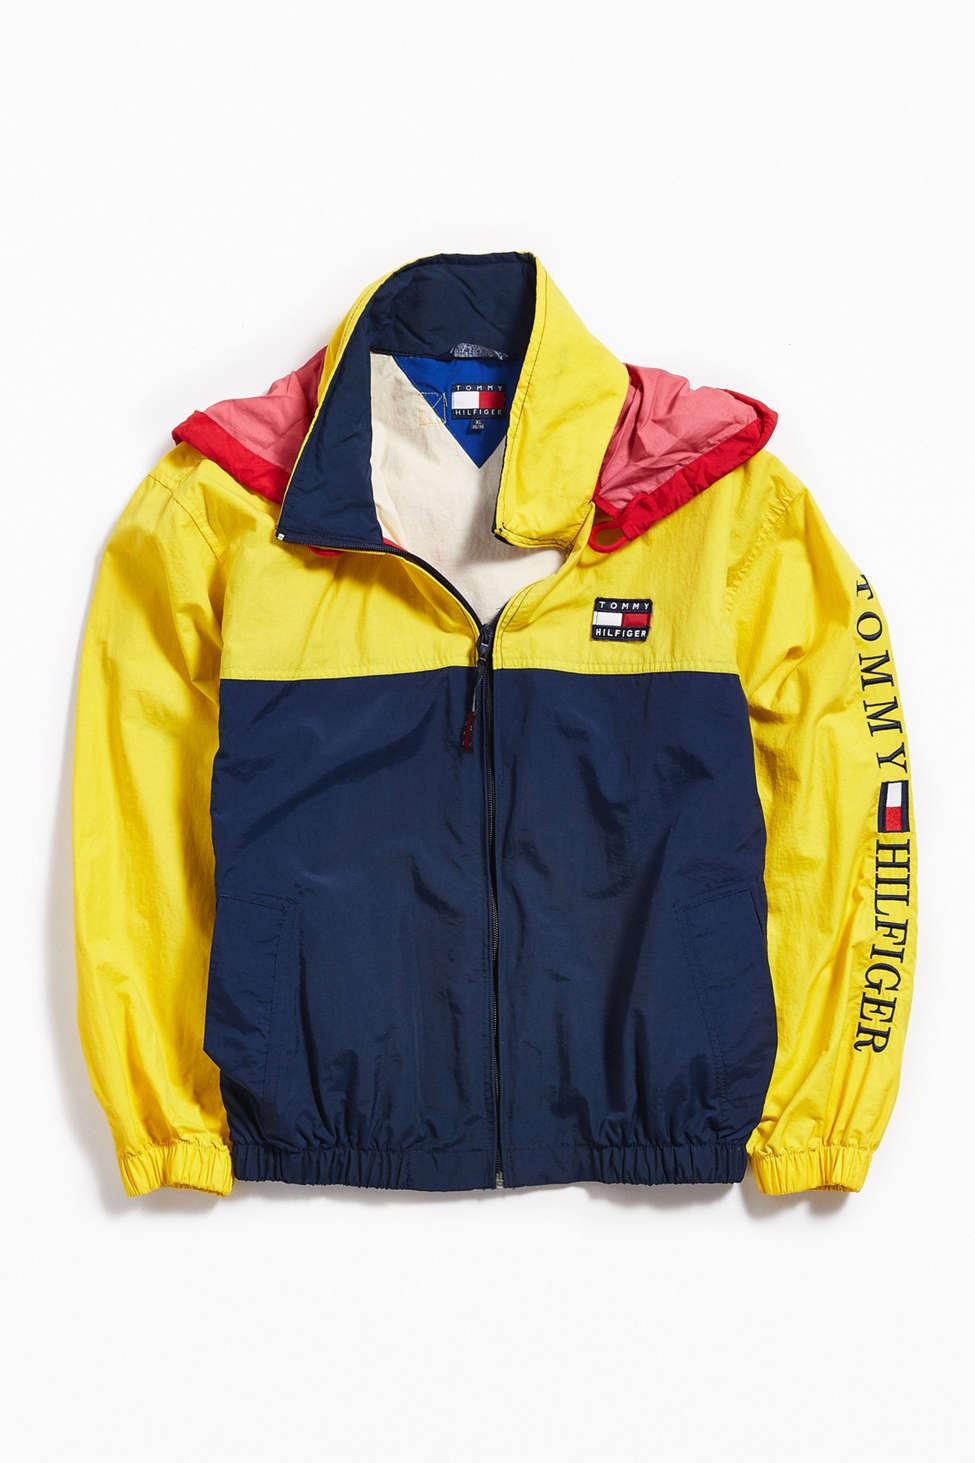 Vintage Tommy Hilfiger Yellow Navy Windbreaker Jacket Urban